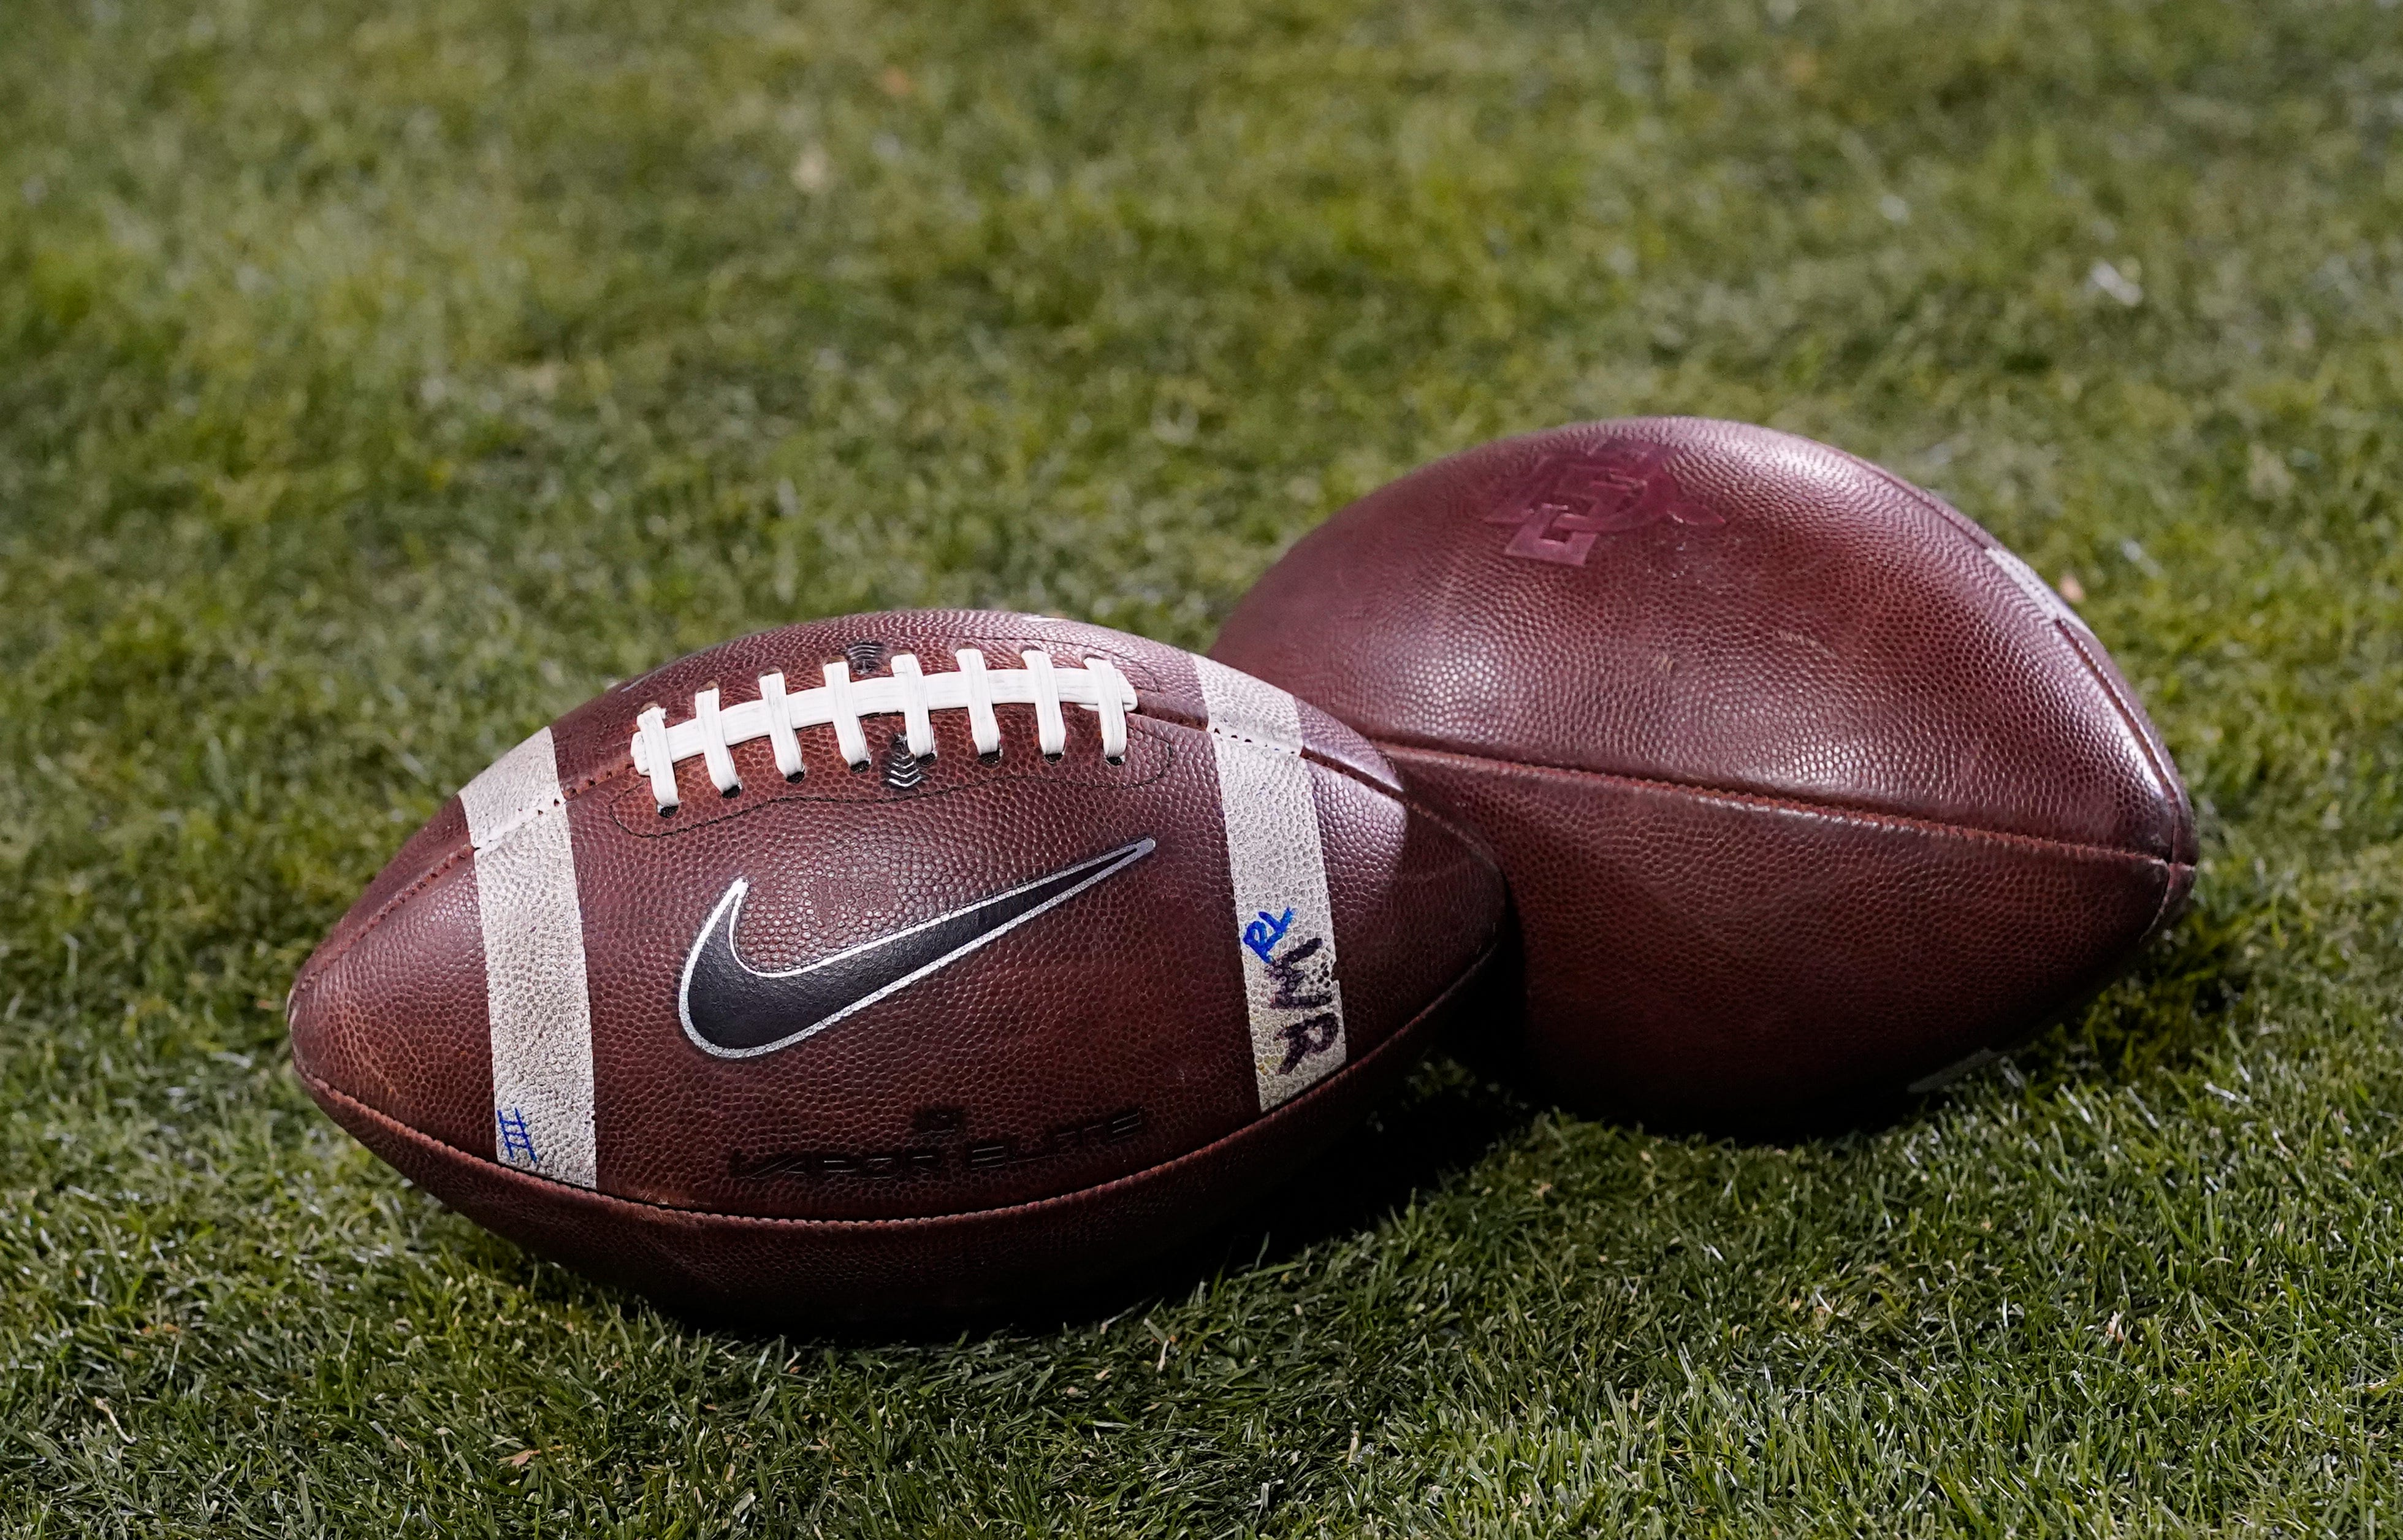 College football COVID updates: California at Washington State game canceled